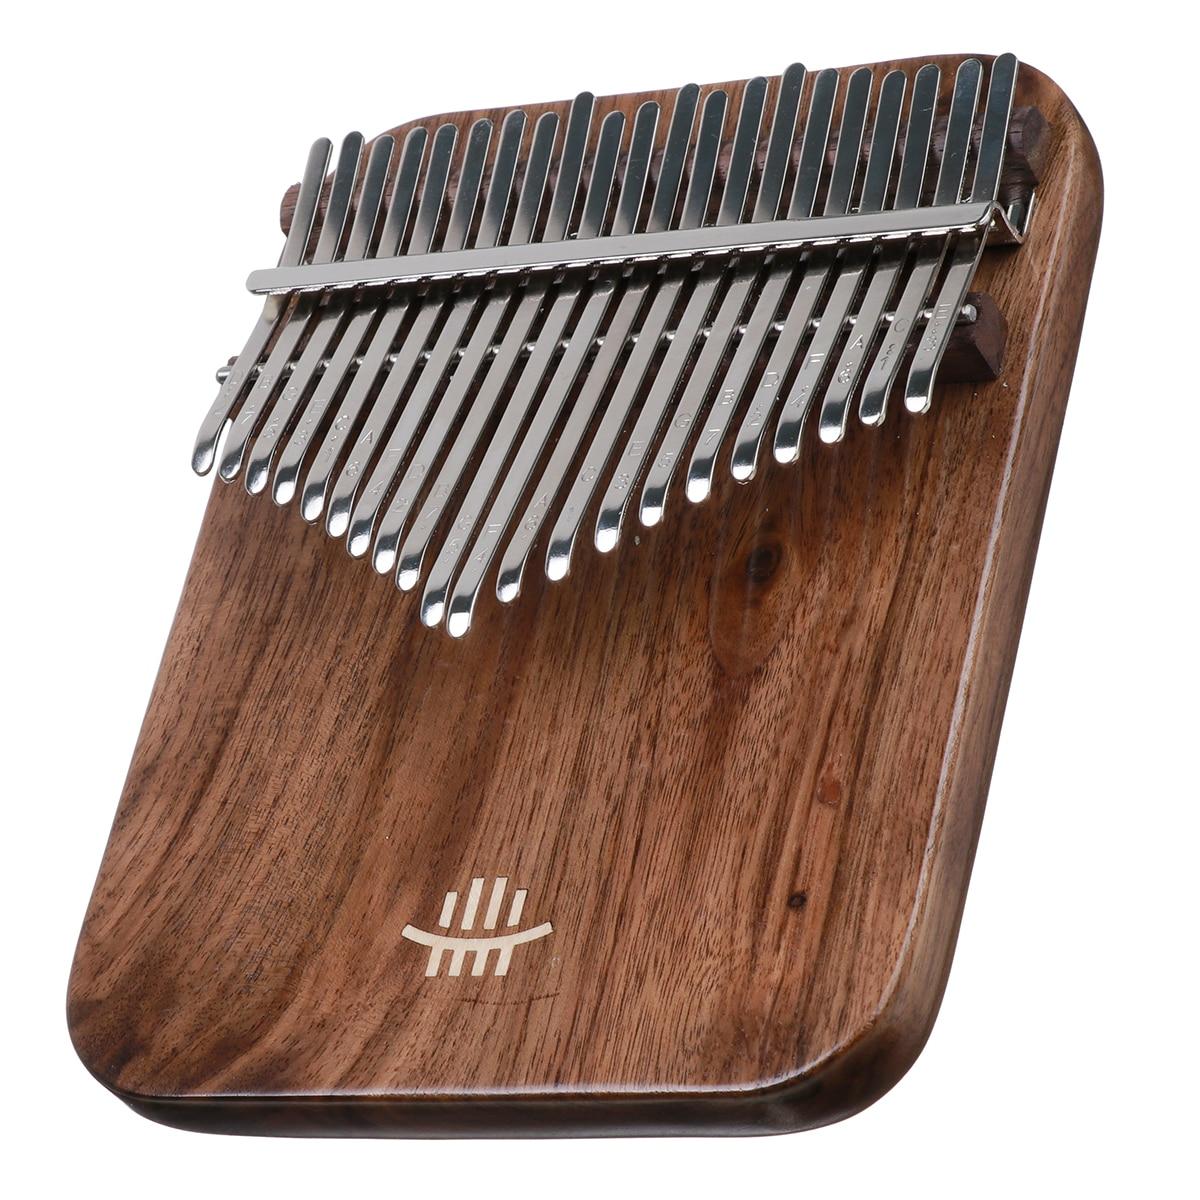 21 Key Kalimba Keyboard Piano Finger Thumb Mbira Mahogany Wood With Accessories enlarge